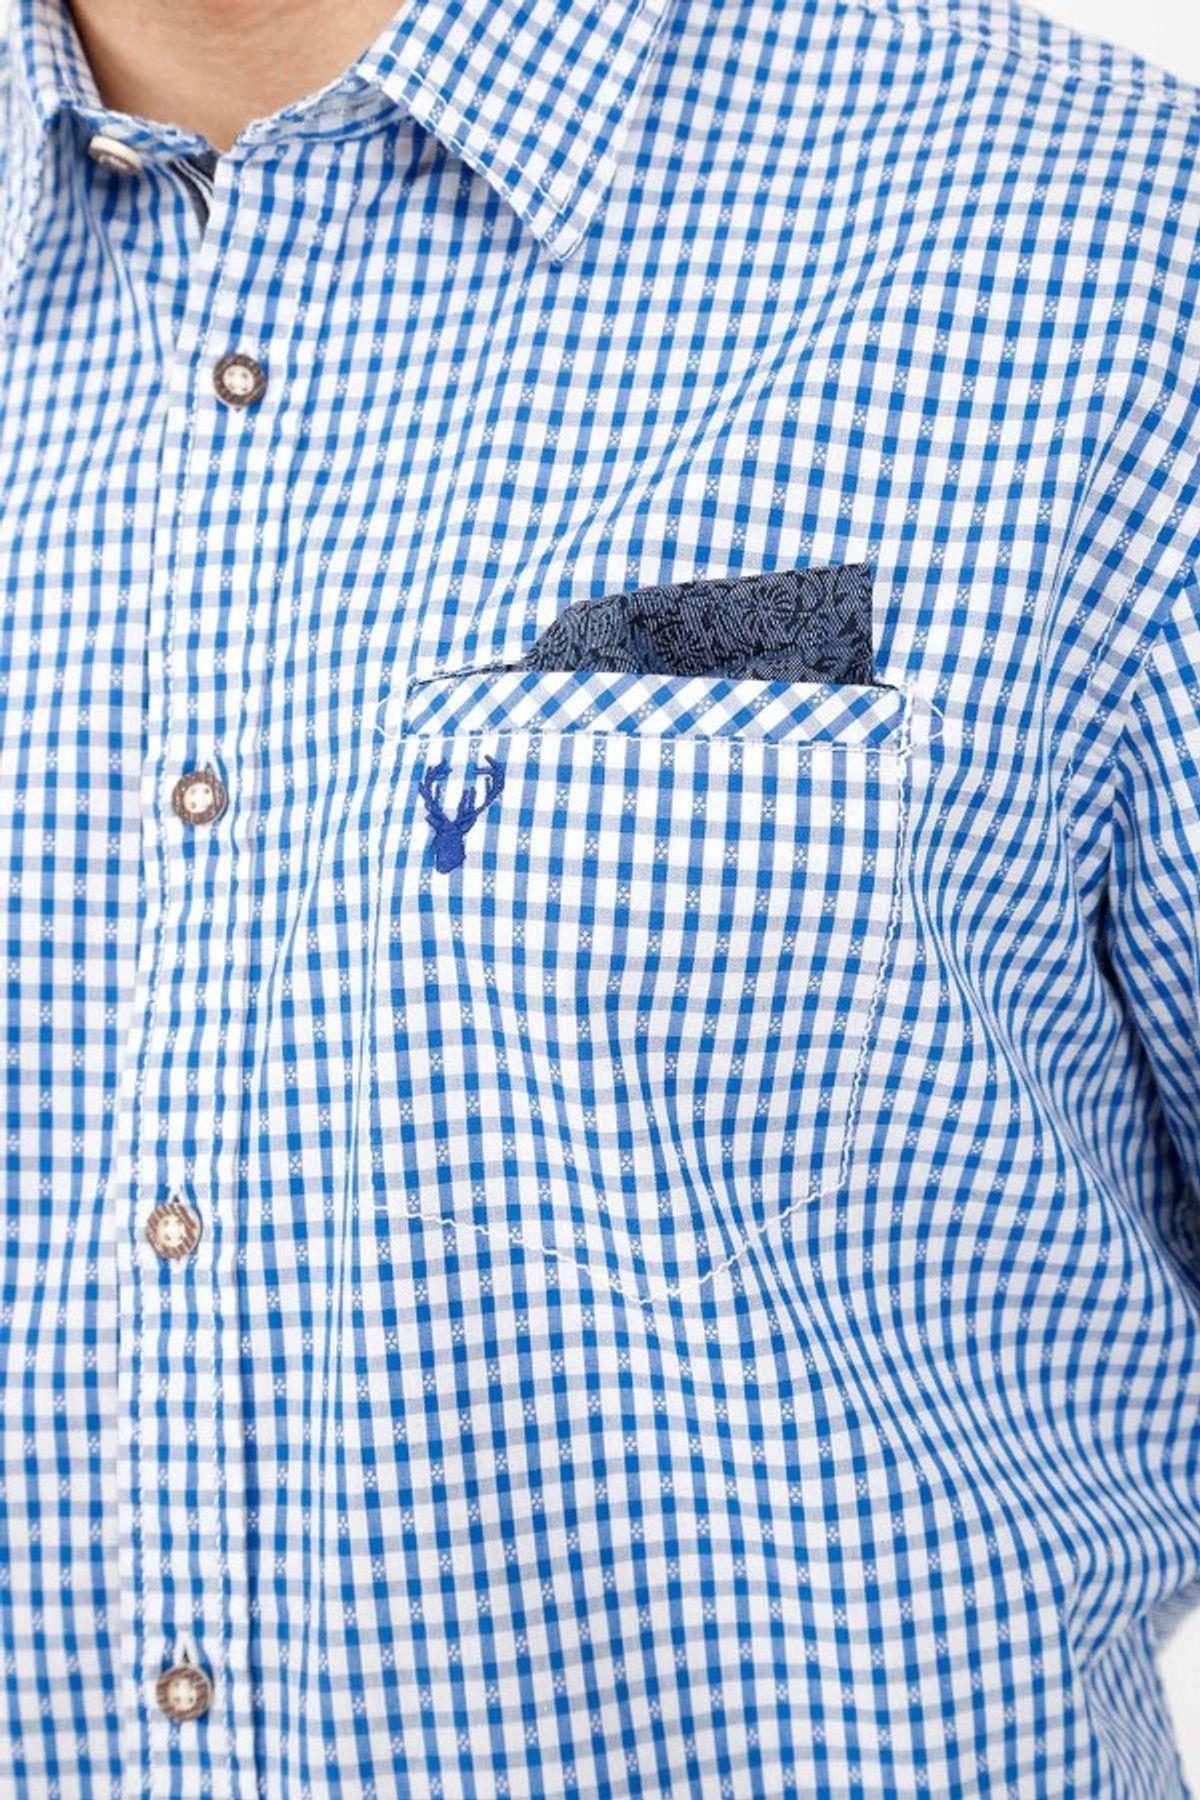 Krüger - Herren Trachtenhemd in blau, Ben (95104-8) – Bild 3